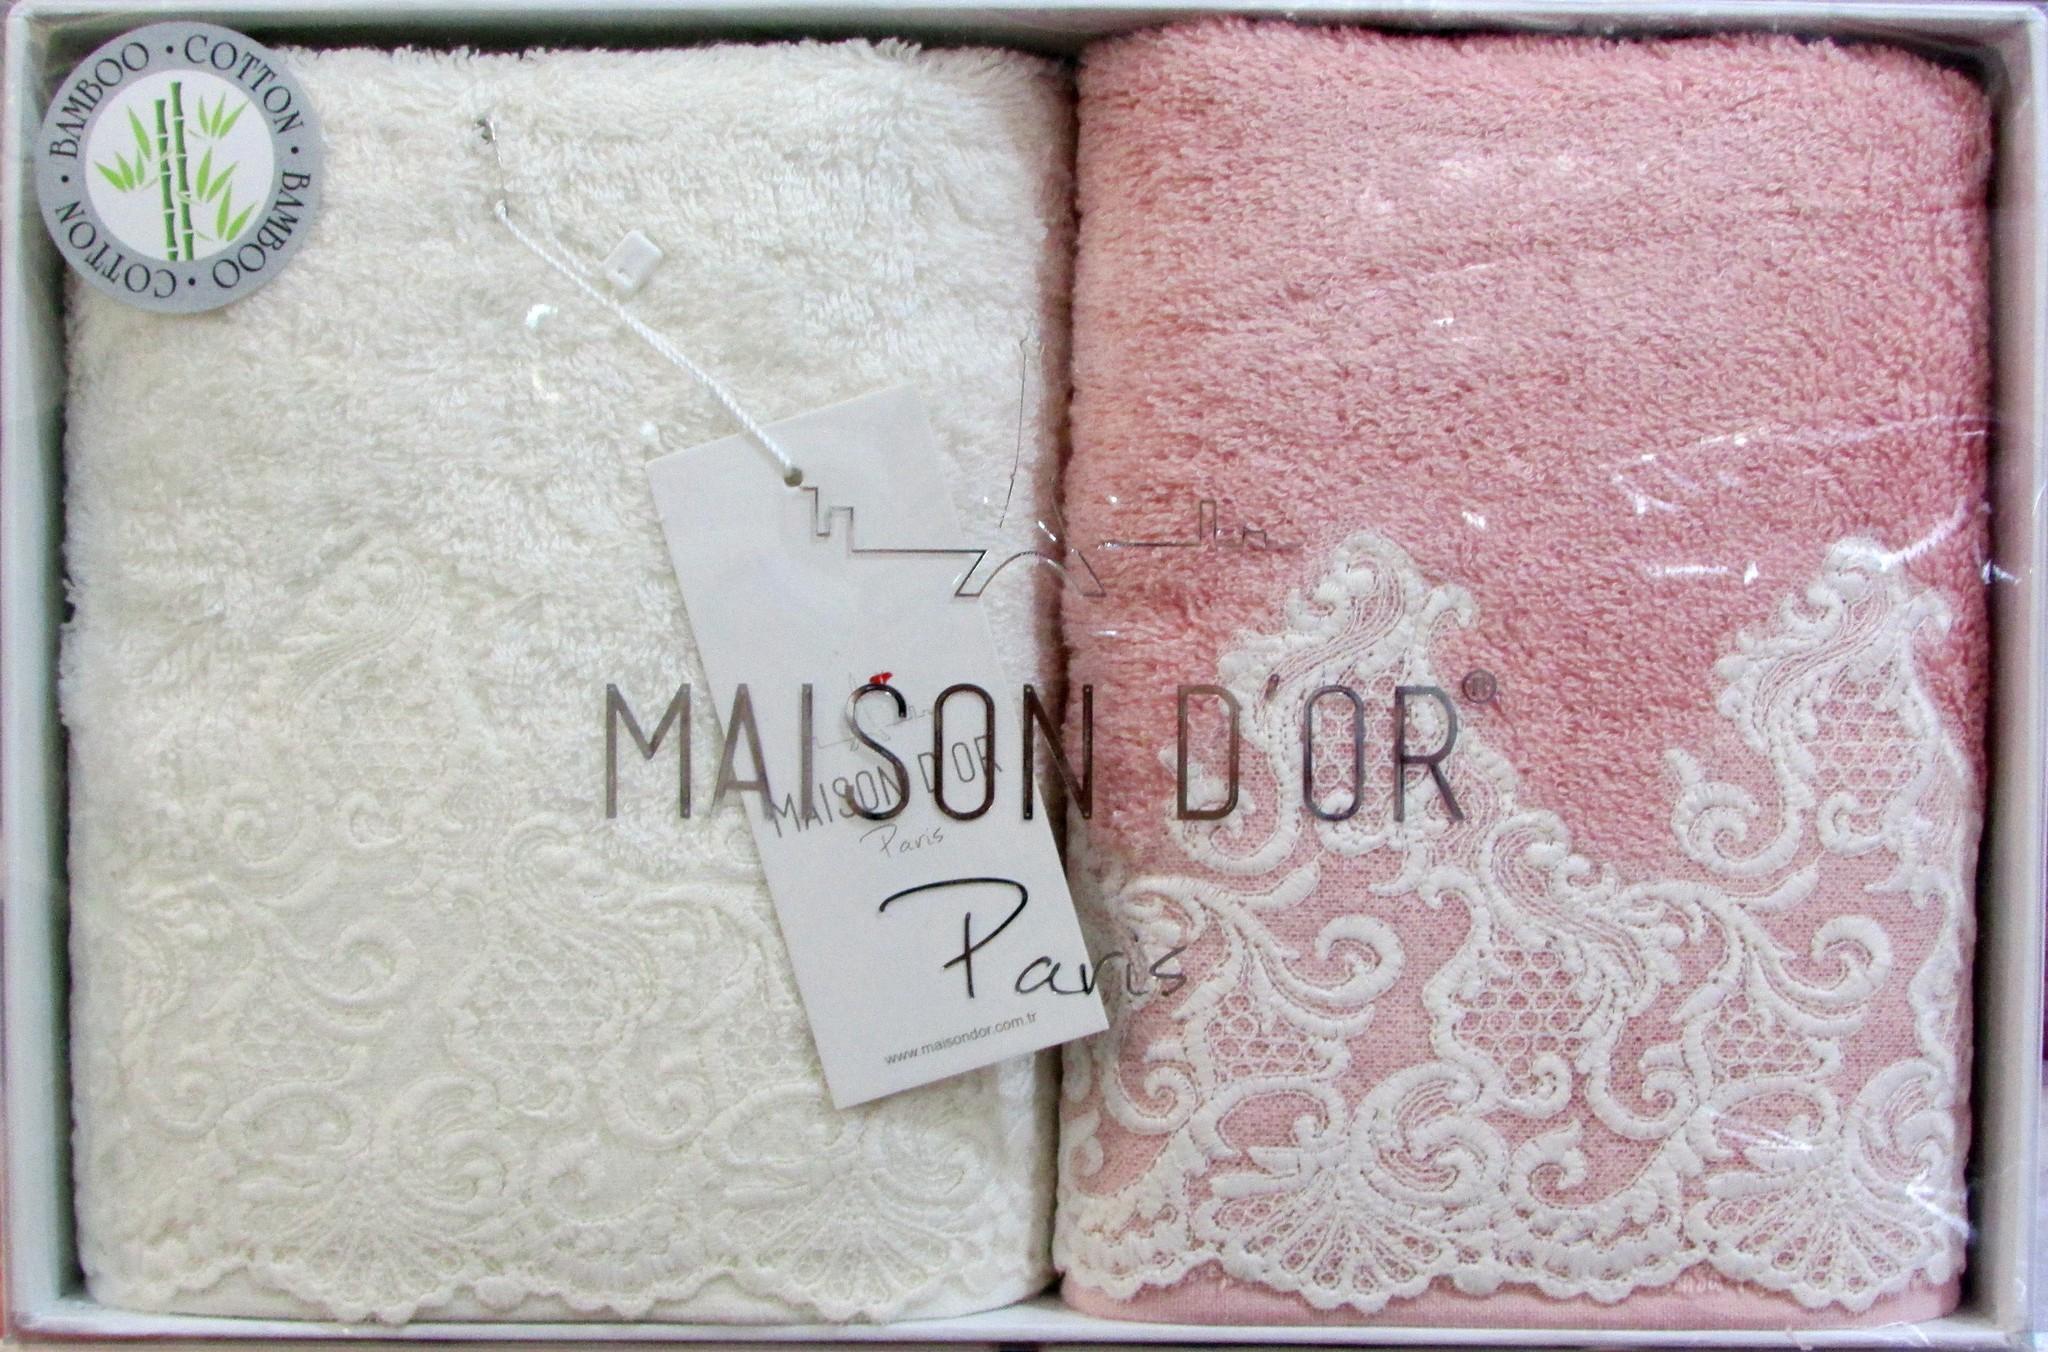 Наборы полотенец Набор полотенец  JASMIN  ЖАСМИН 2пр 50х100 Maison Dor Турция жасмин_2_1.jpg